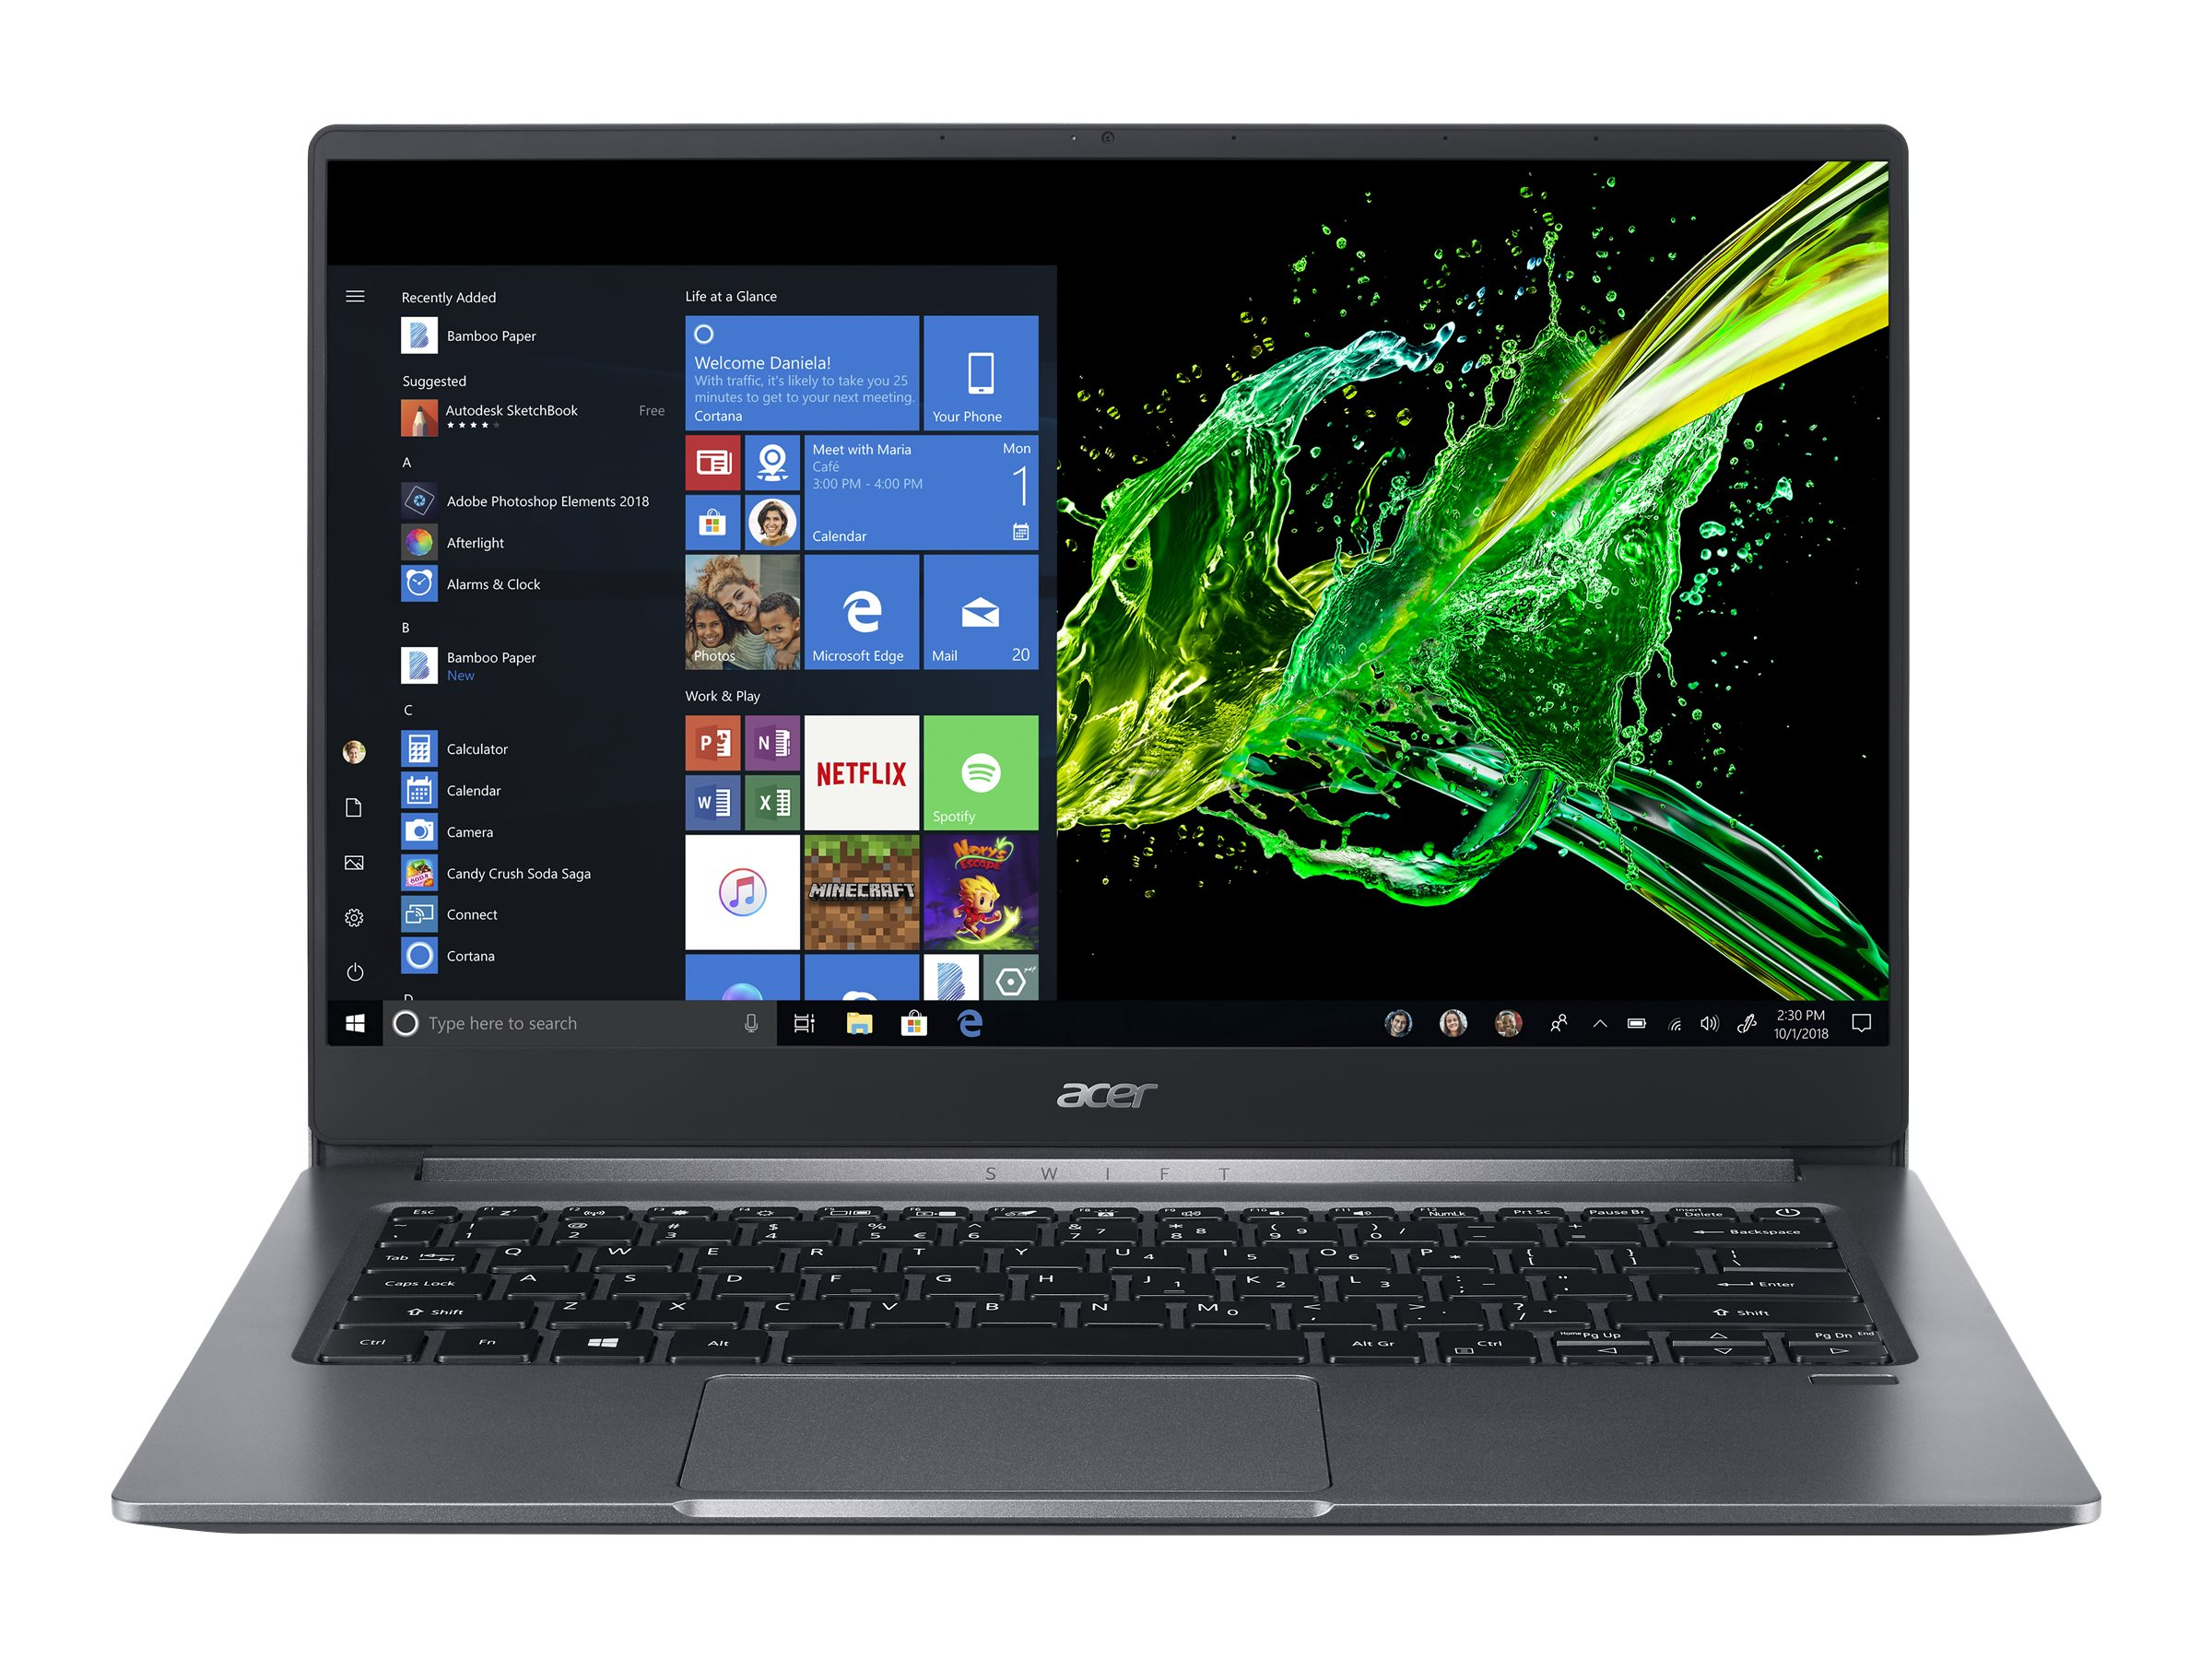 "Acer Swift 3 SF314-57-57T2 - Core i5 1035G1 / 1 GHz - ESHELL - 8 GB RAM - 512 GB SSD - 35.6 cm (14"")"